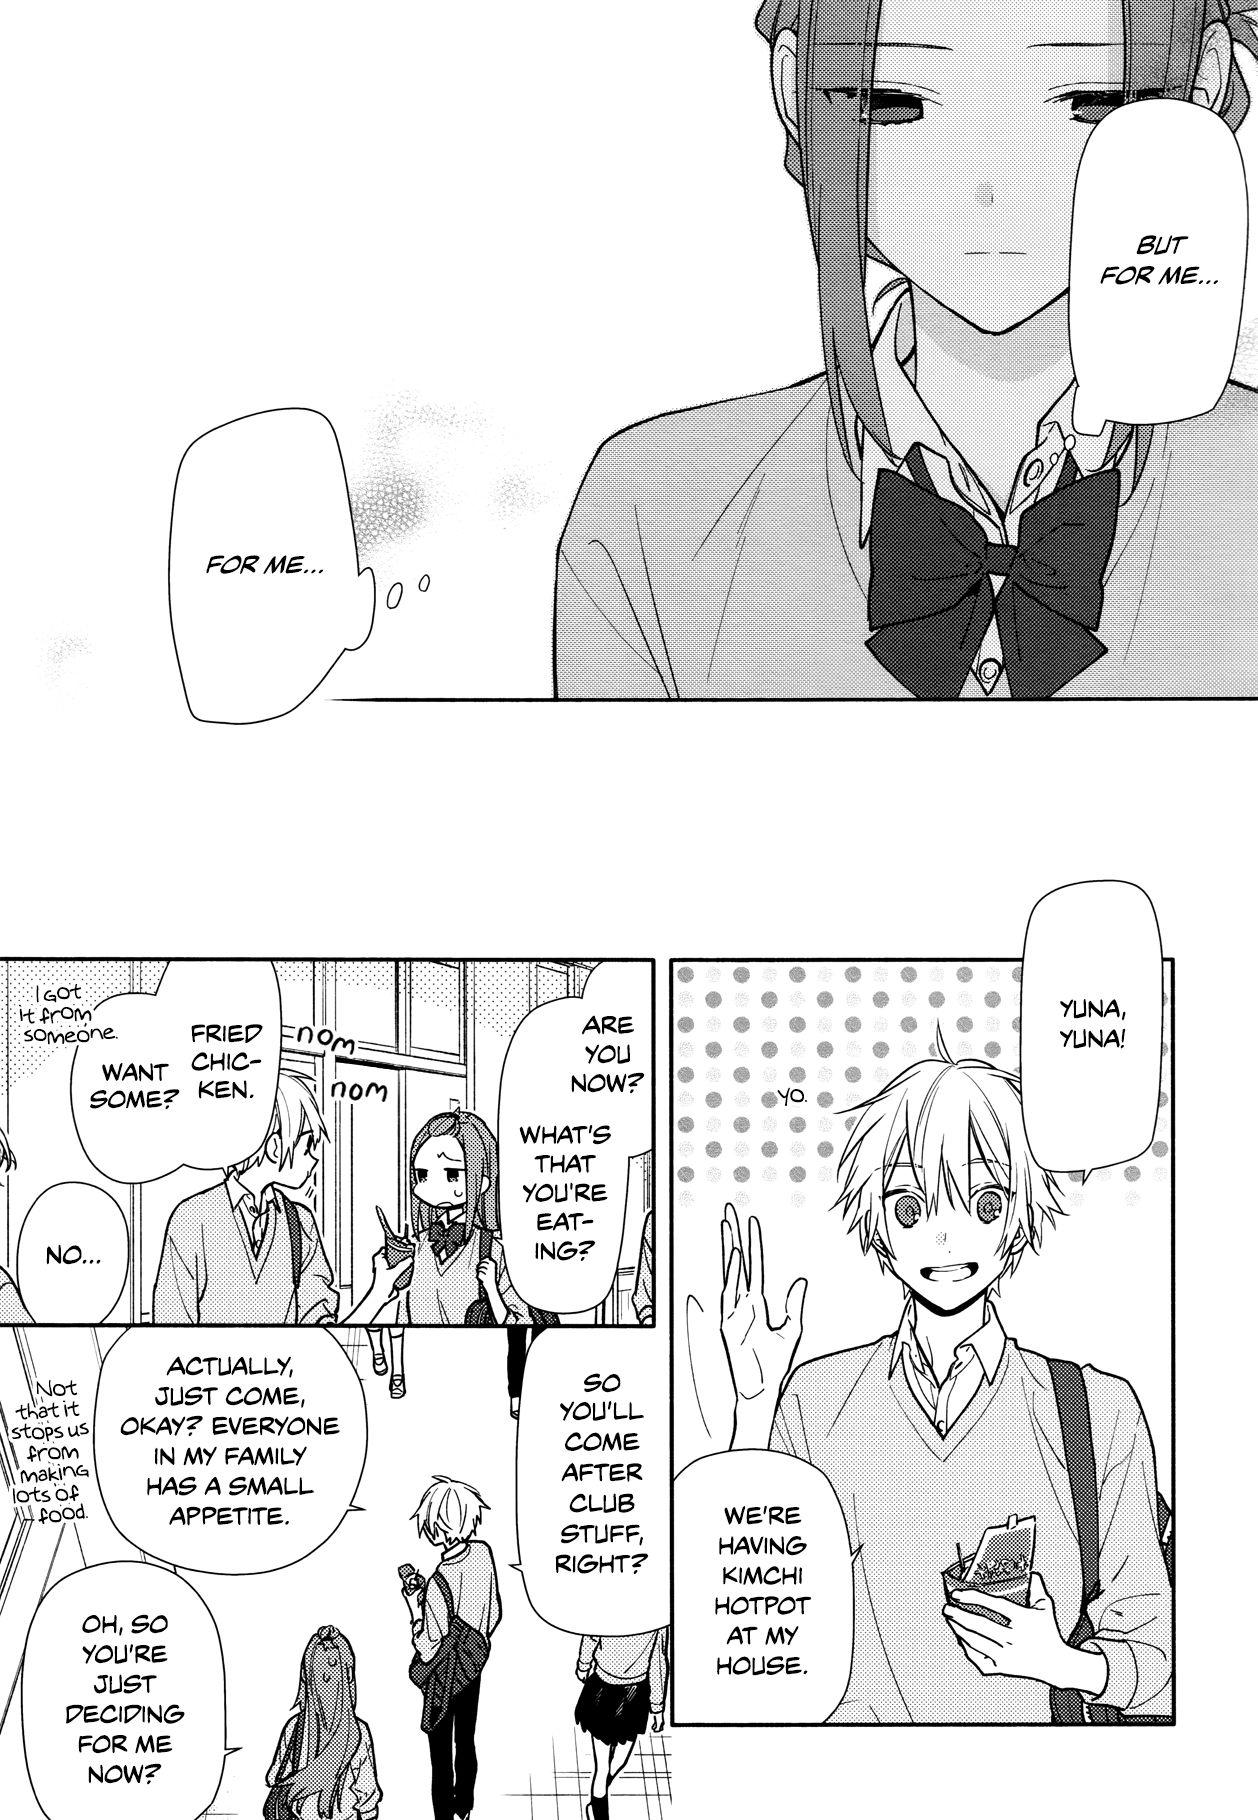 Horimiya, Chapter 120 Page 15